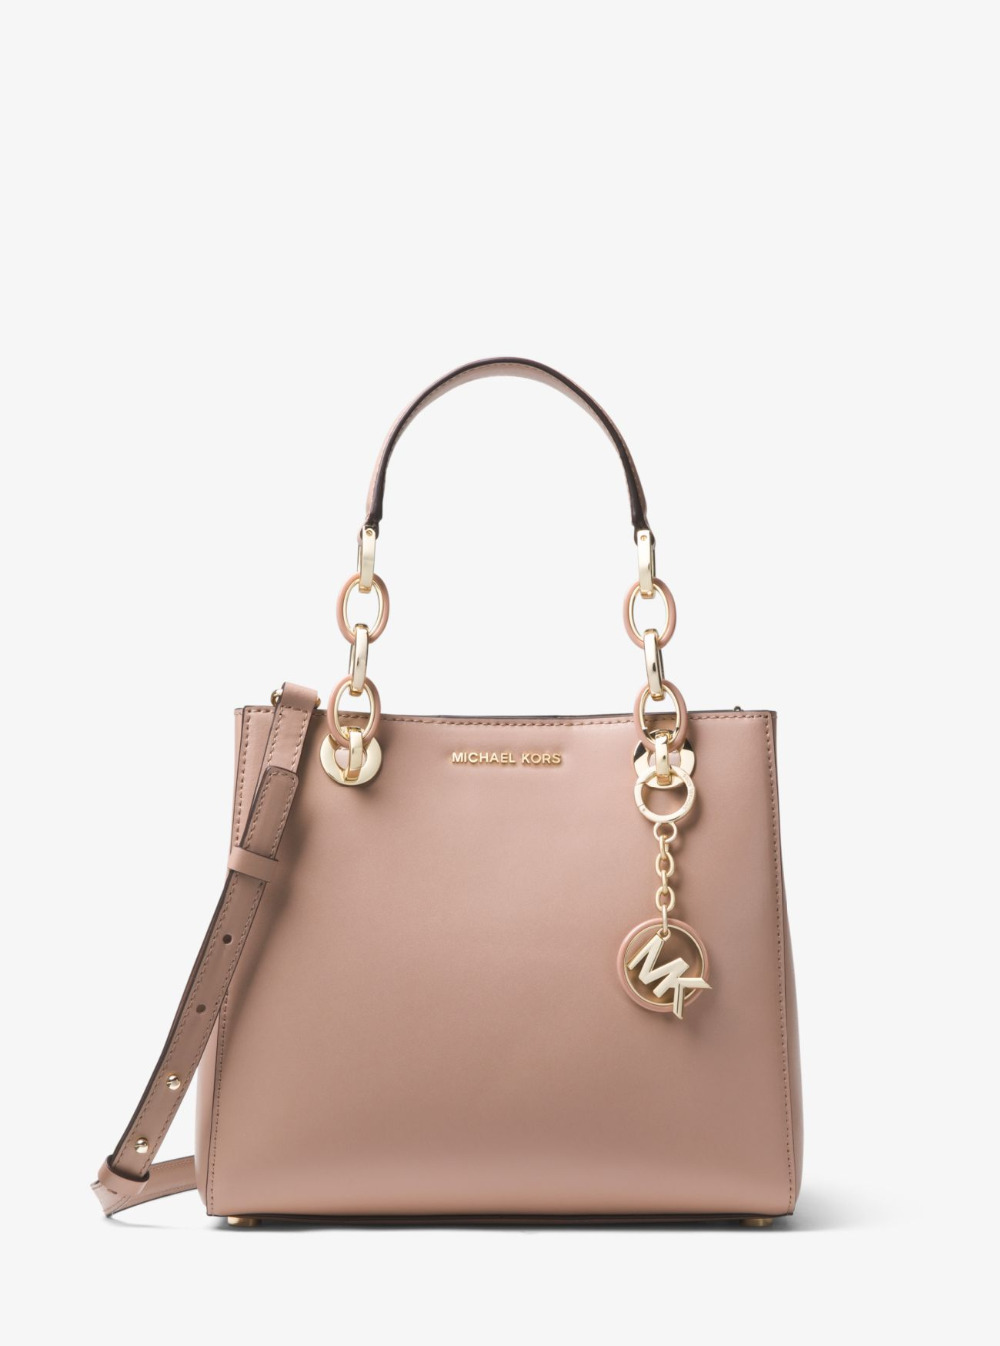 Michael Kors Cynthia Dressy Satchel Luxury Handbags For